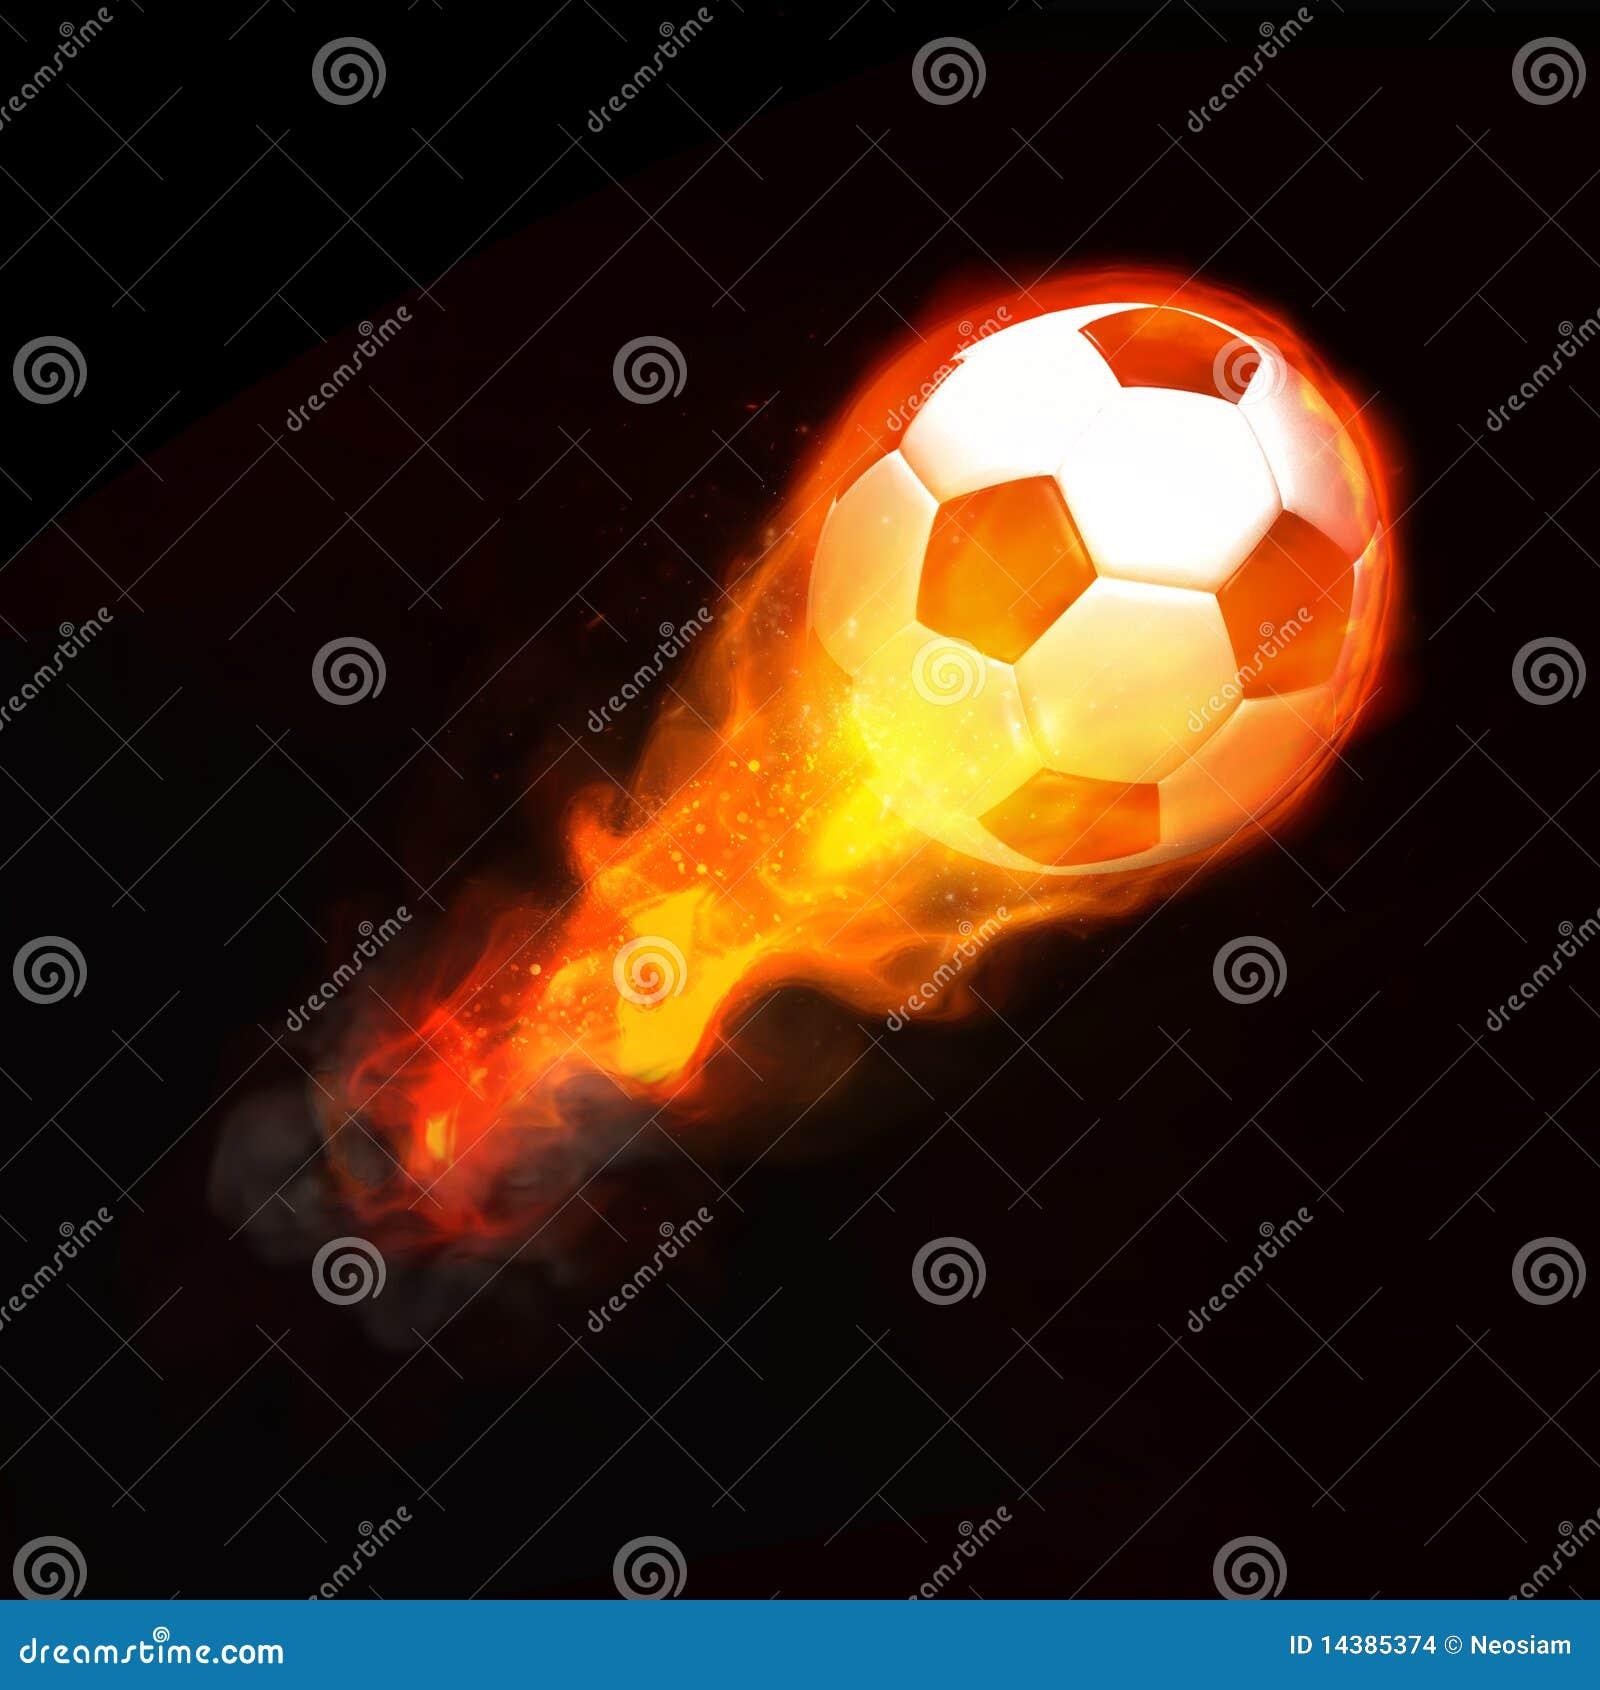 Hot soccer ball